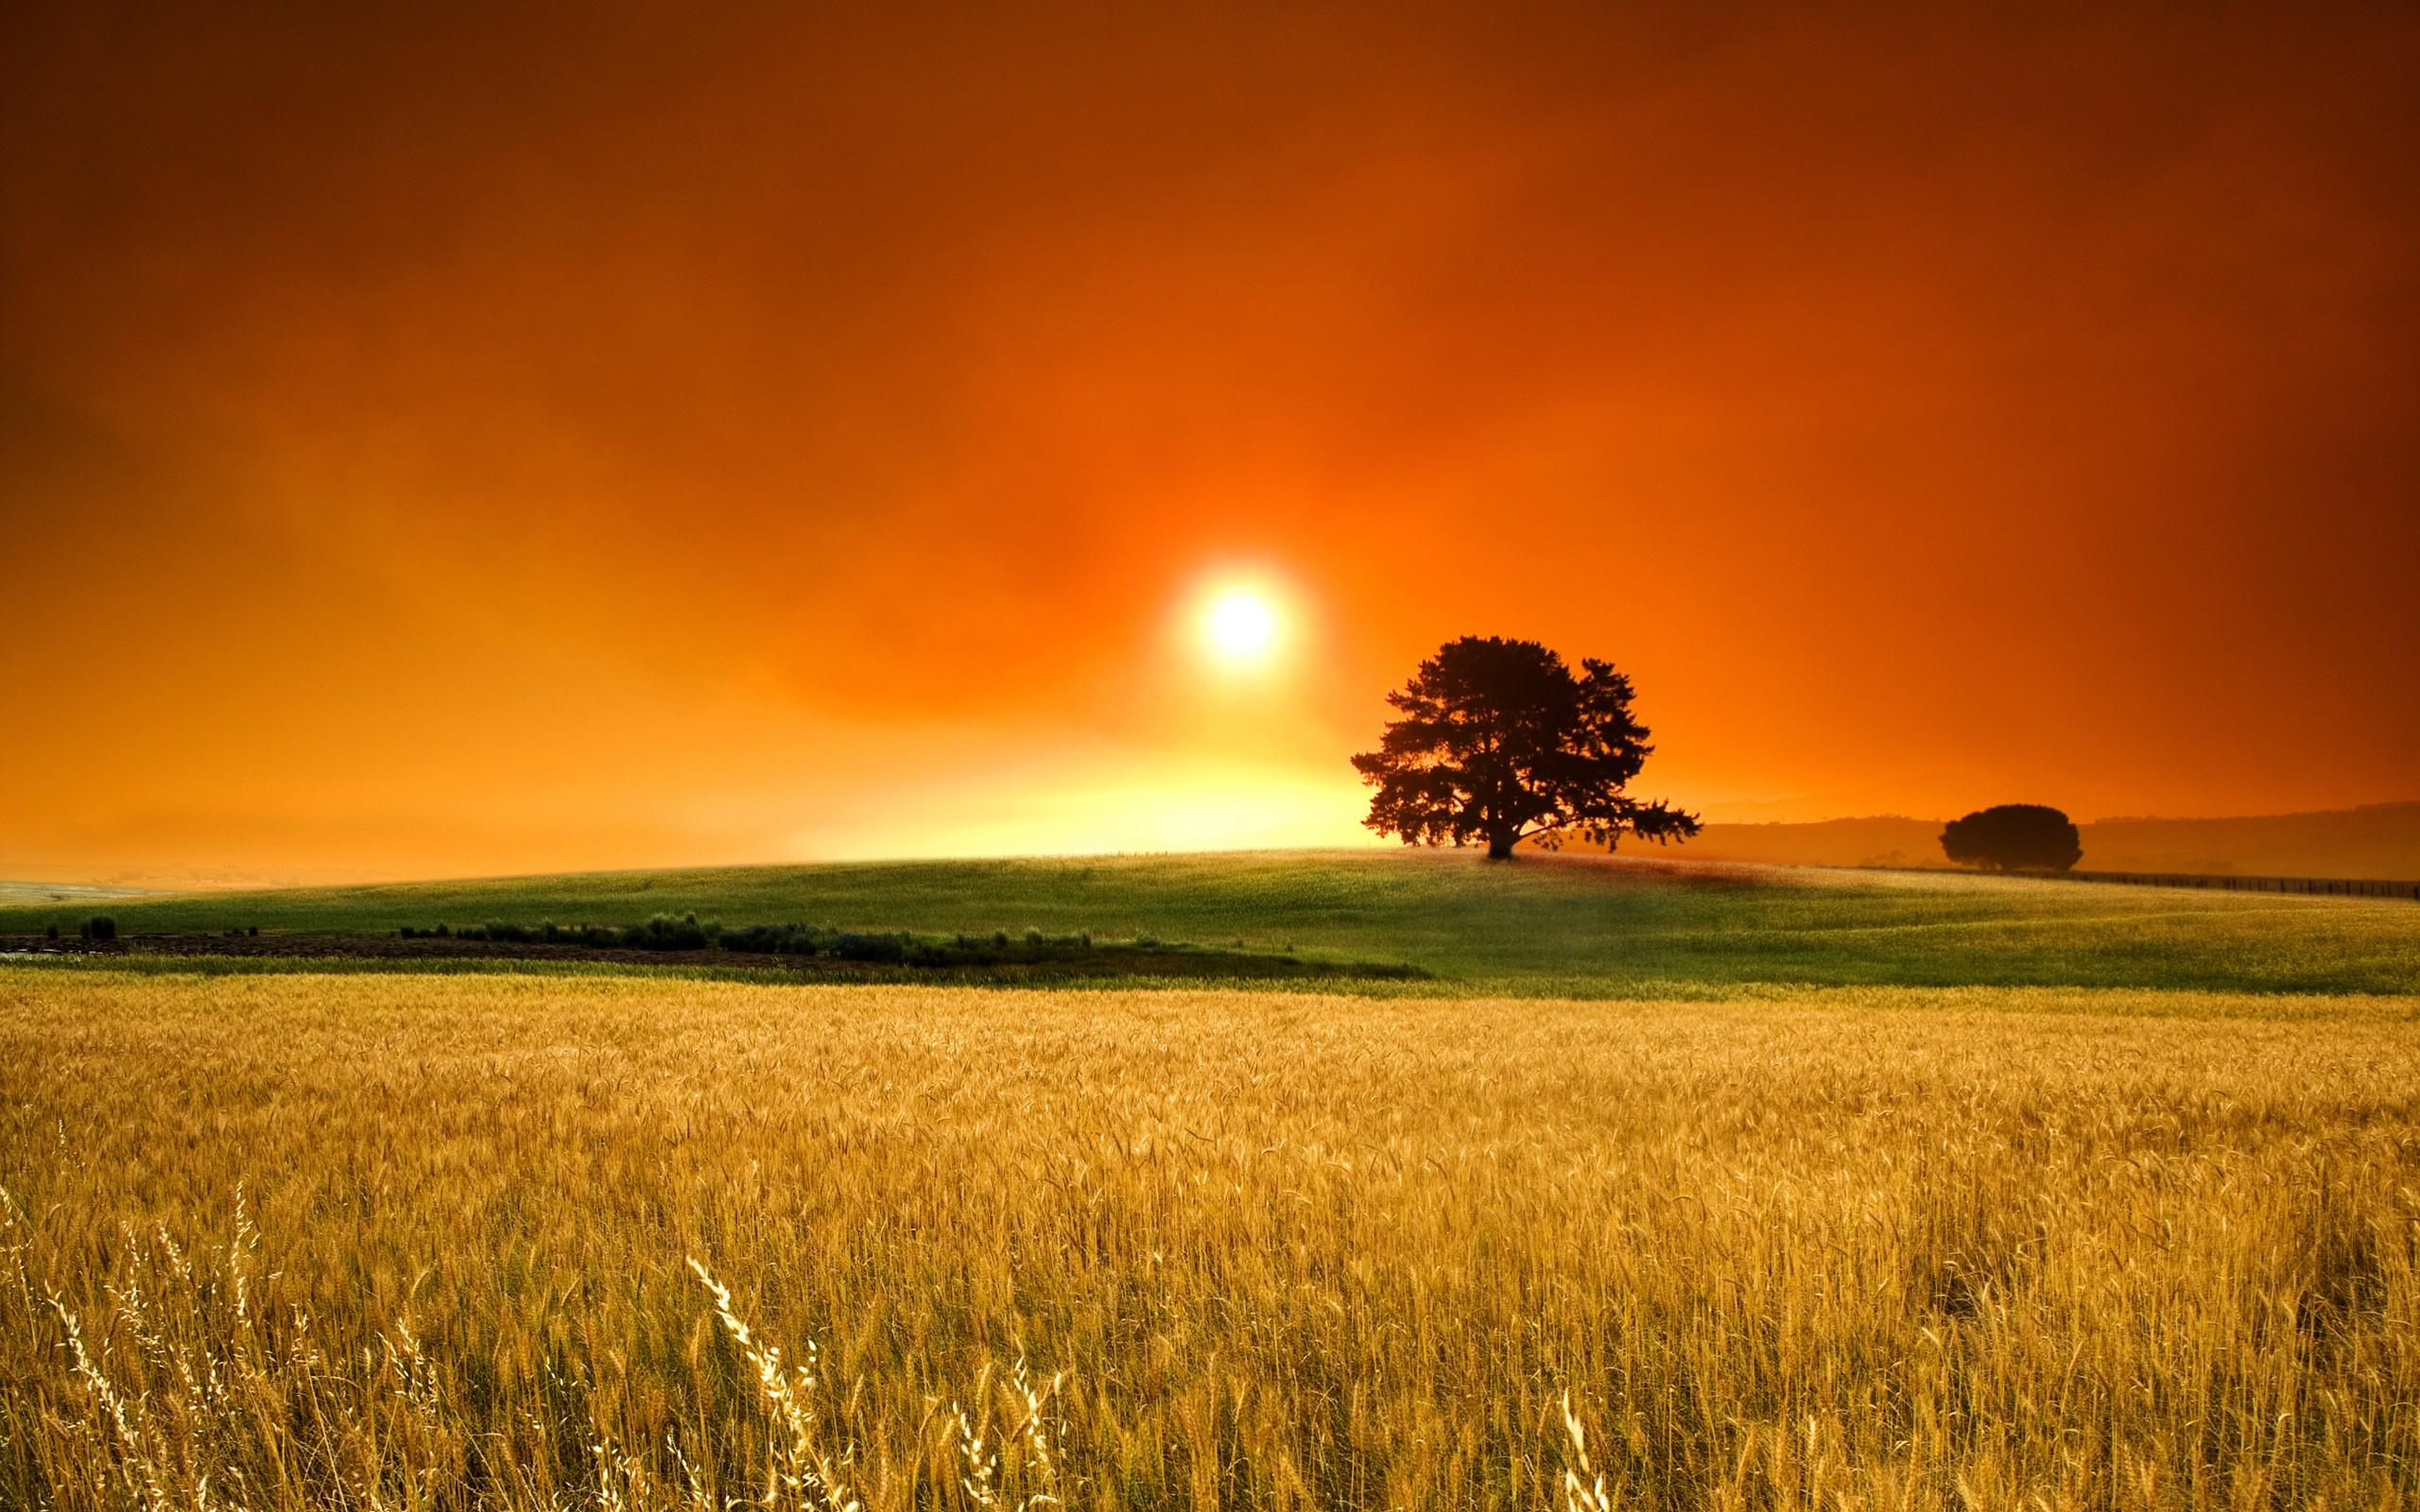 Hd wallpaper - Sunset PNG HD